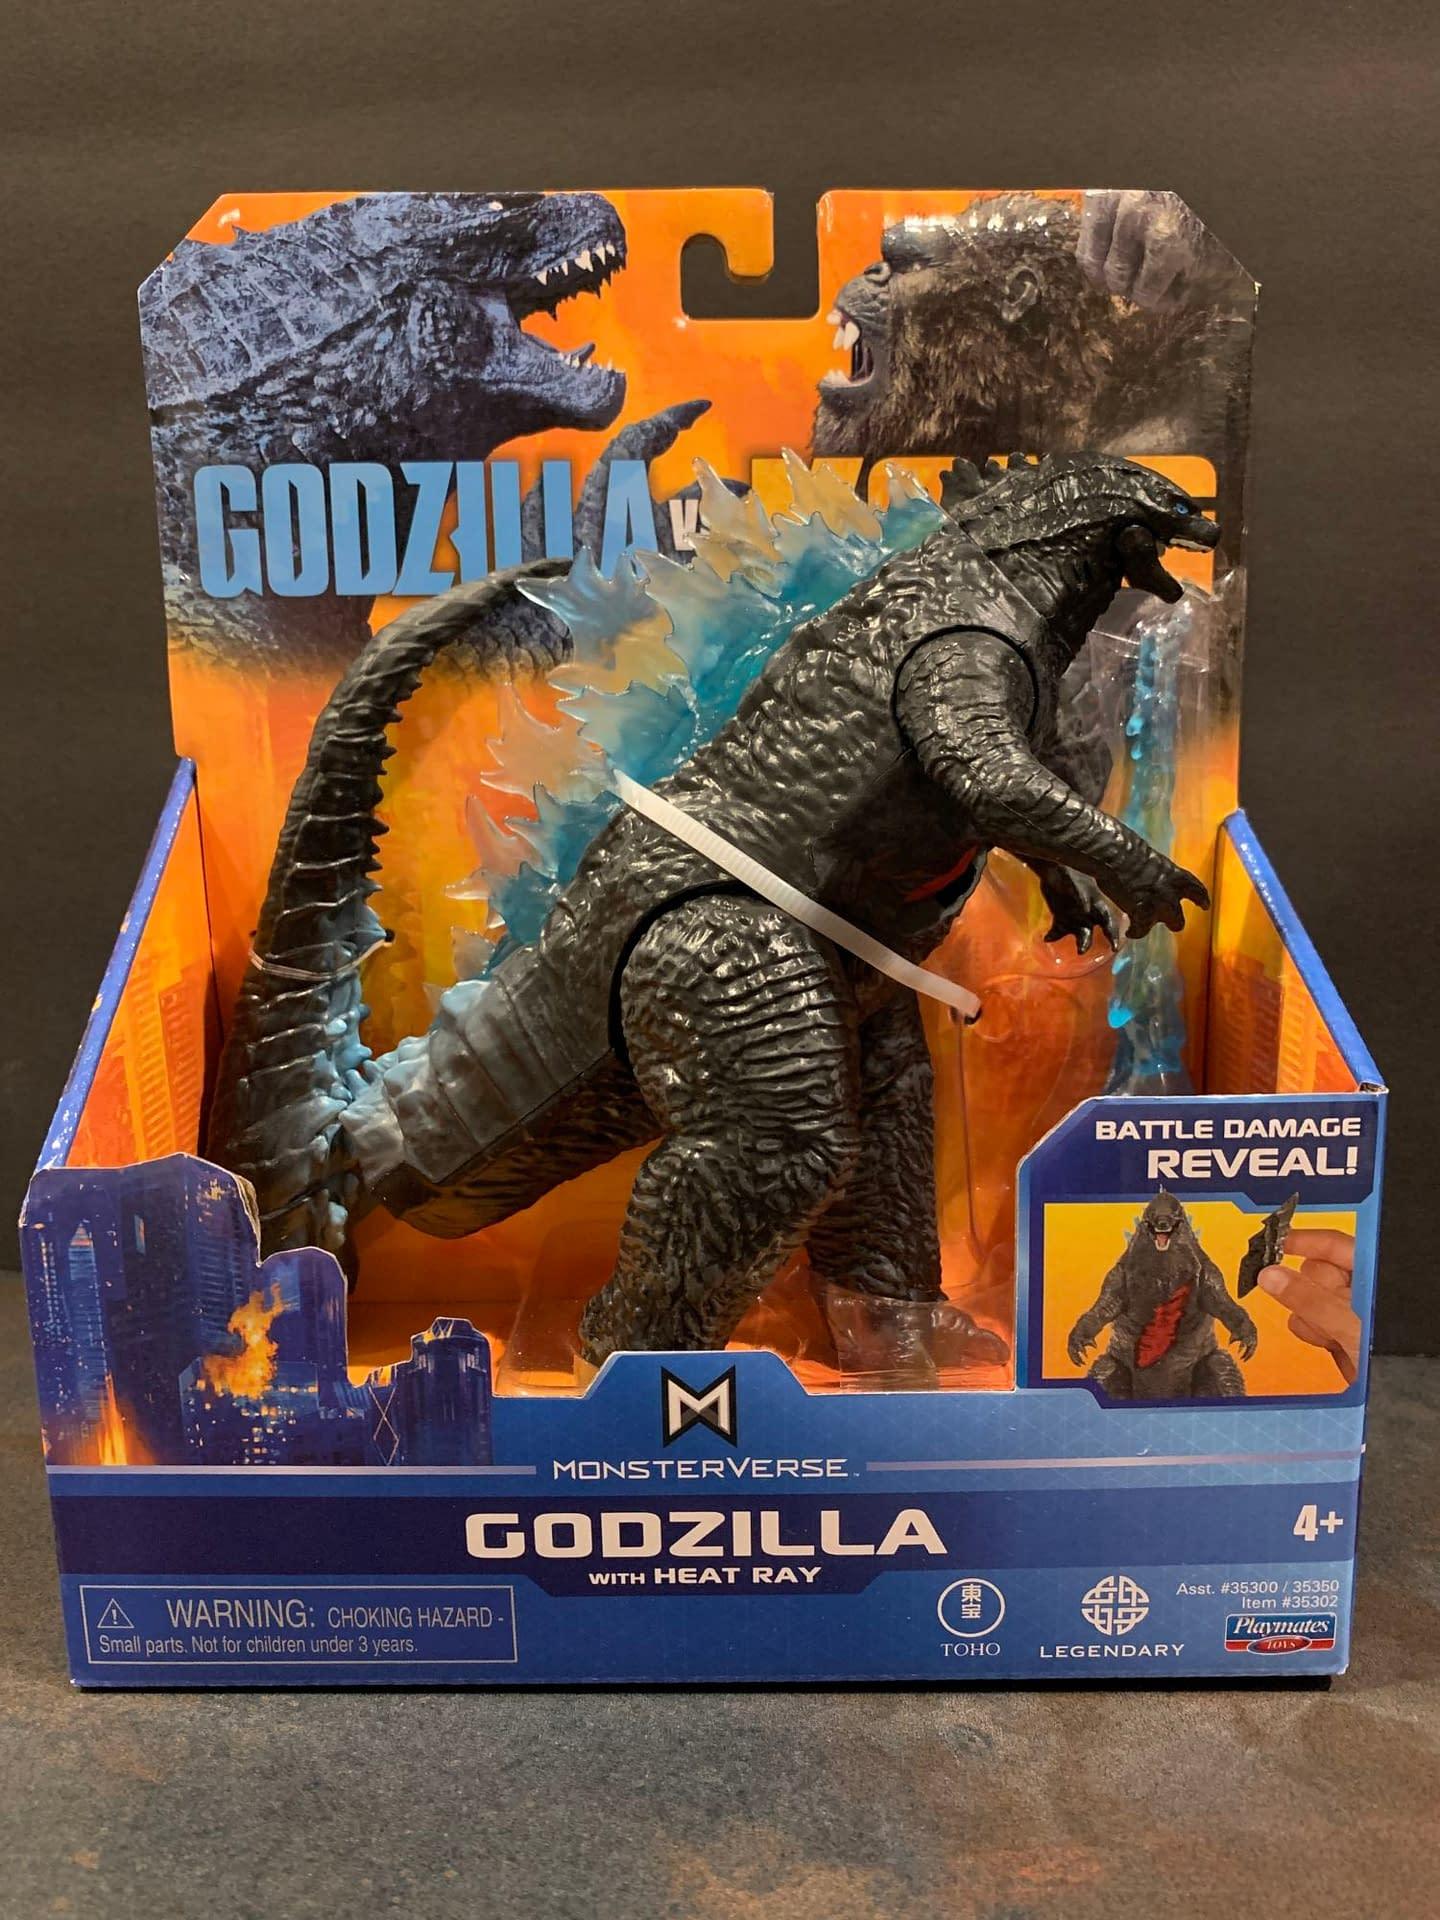 Godzilla Vs Kong: Let's Look At The Playmates Battle Damaged Figures